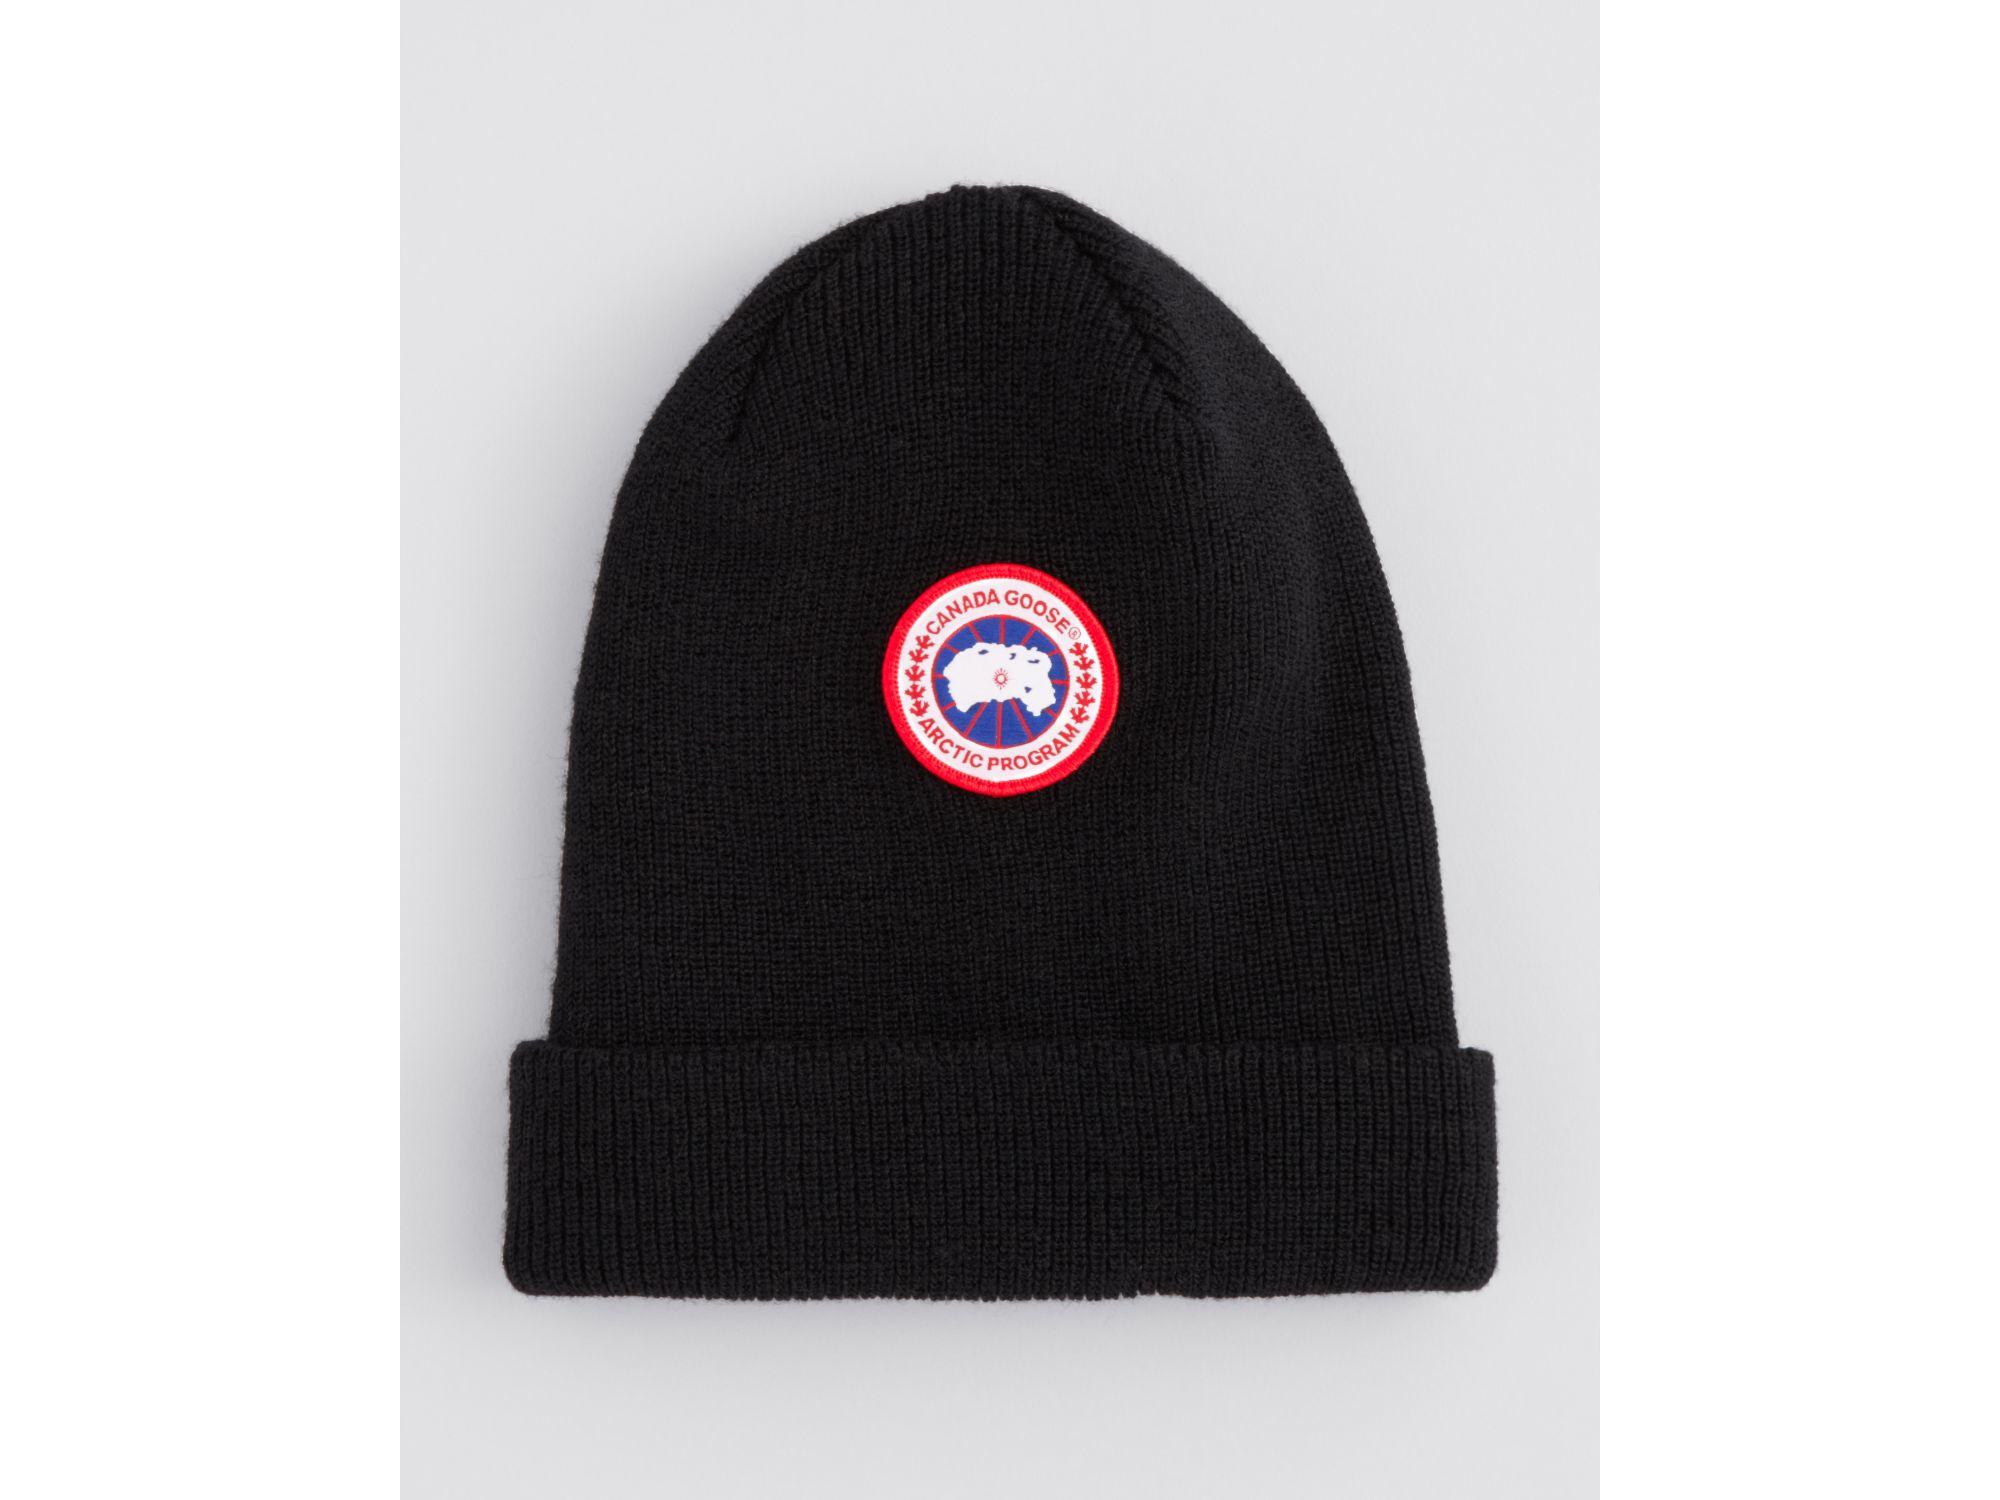 Lyst - Canada Goose Merino Wool Watch Cap in Black for Men 7617c5873ea